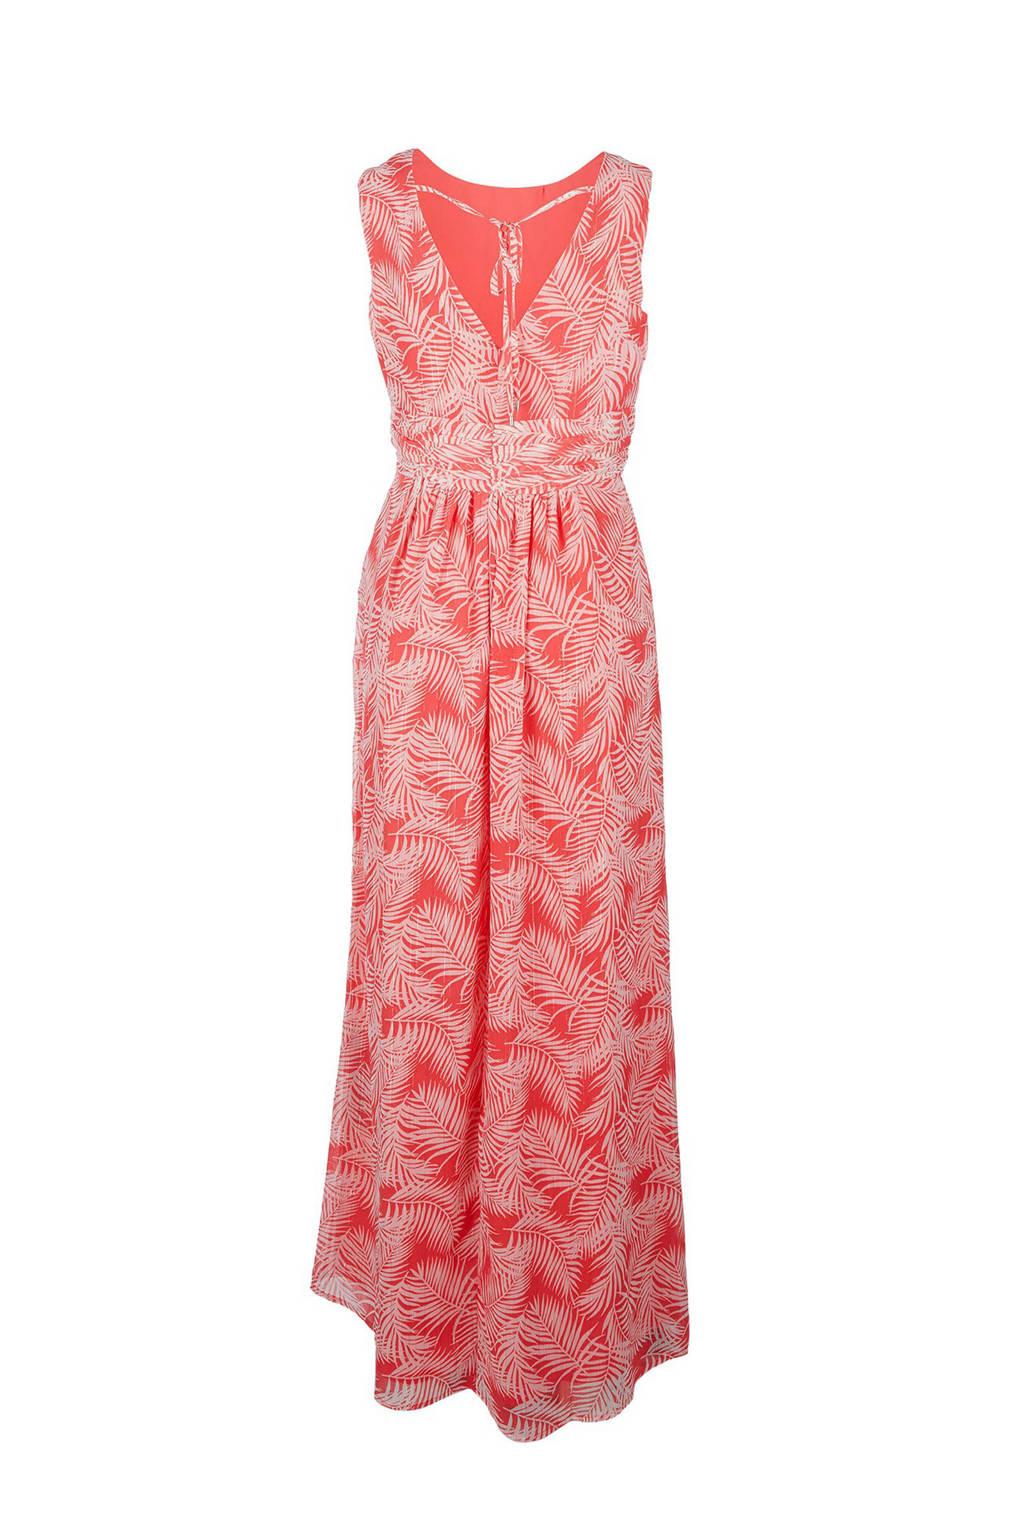 s.Oliver maxi jurk met all over print en glitters roze, Roze